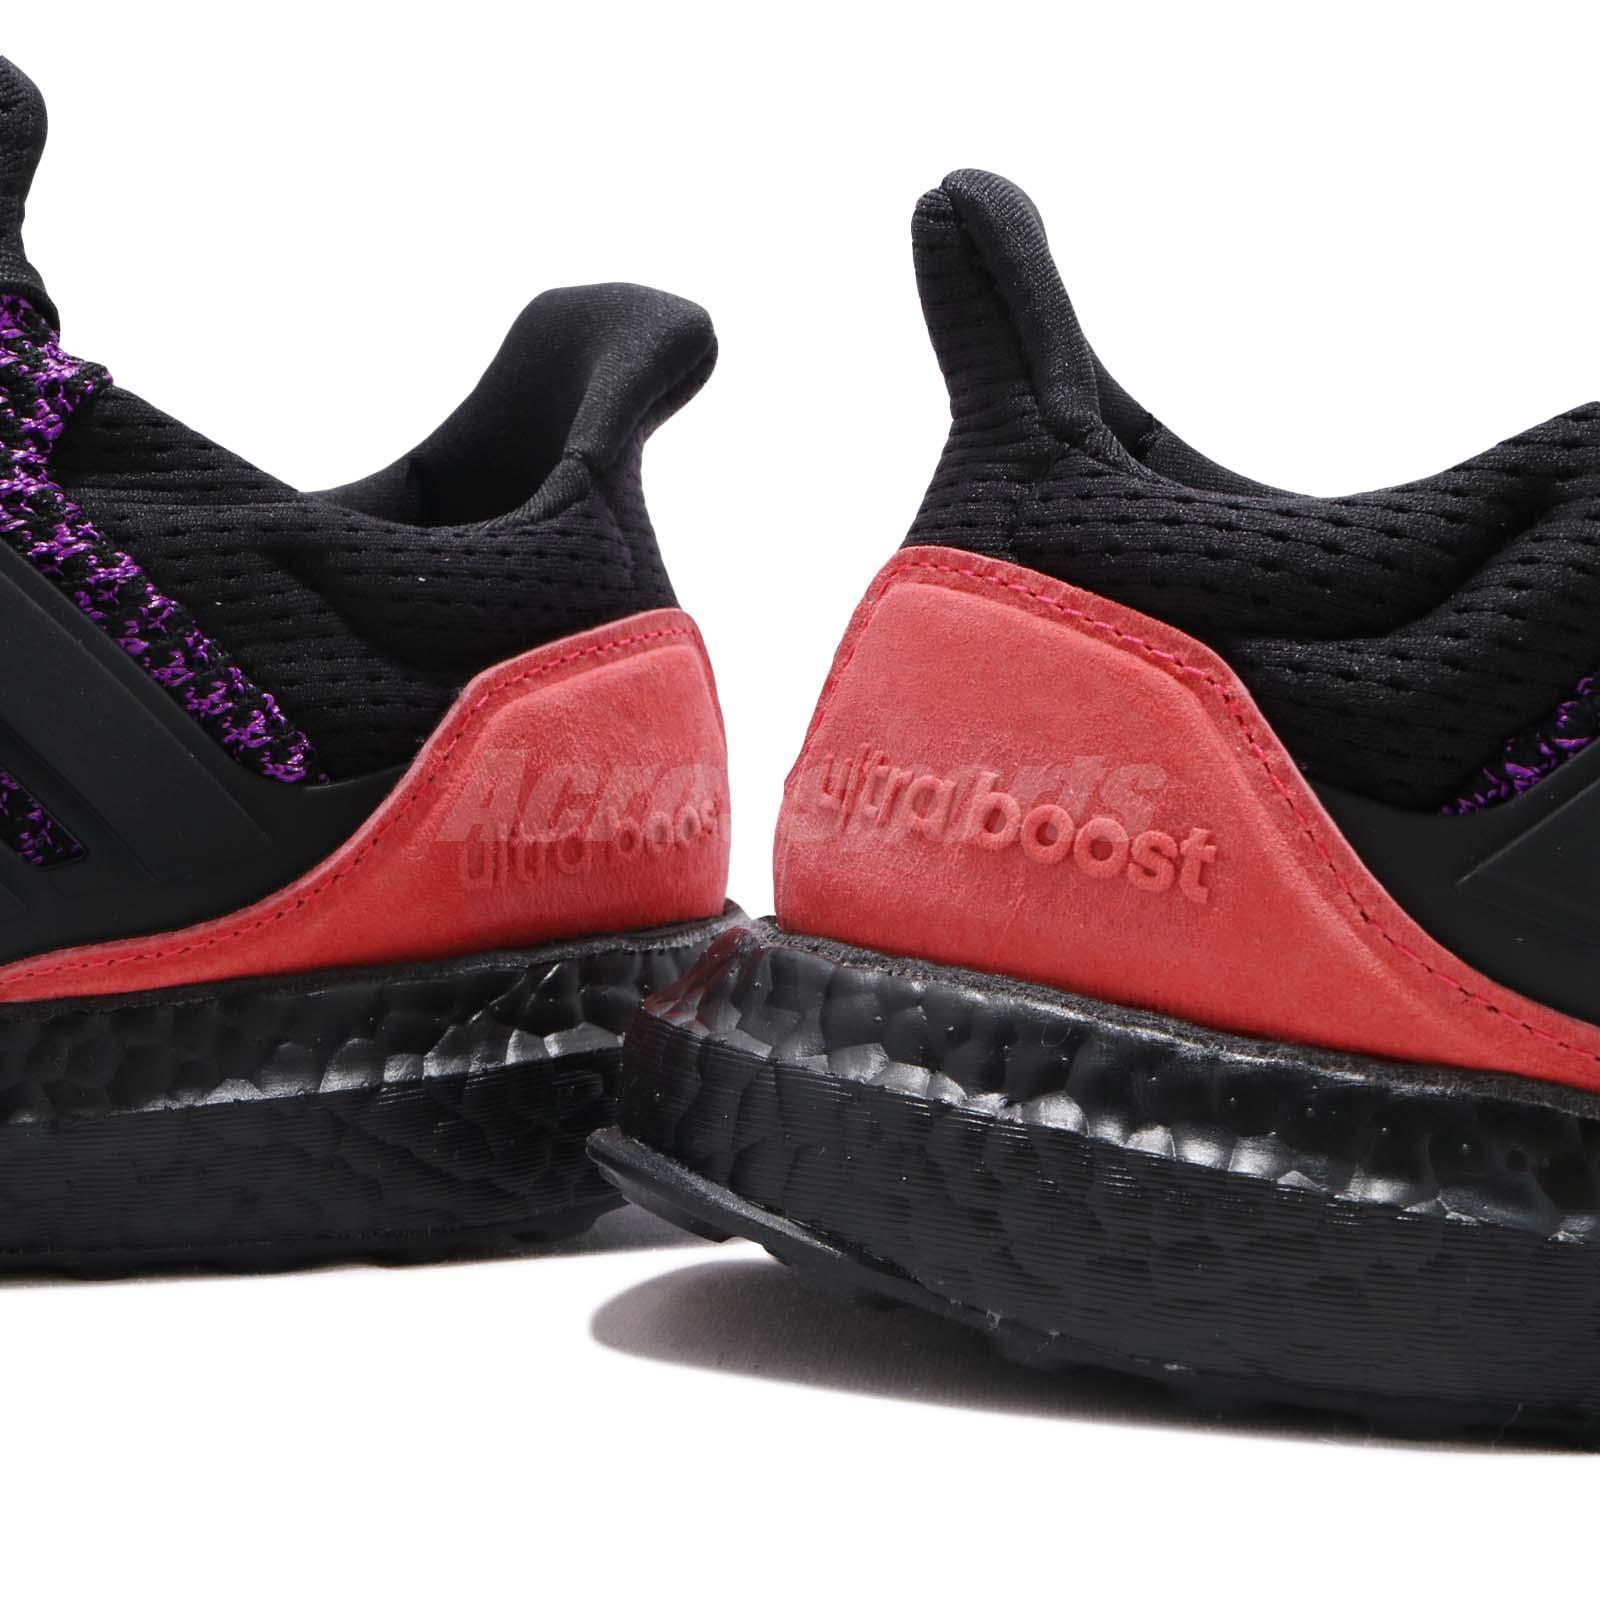 ba2a6ee30dc3b adidas UltraBOOST CBC Black Purple Pink Men Running Training Shoe ...